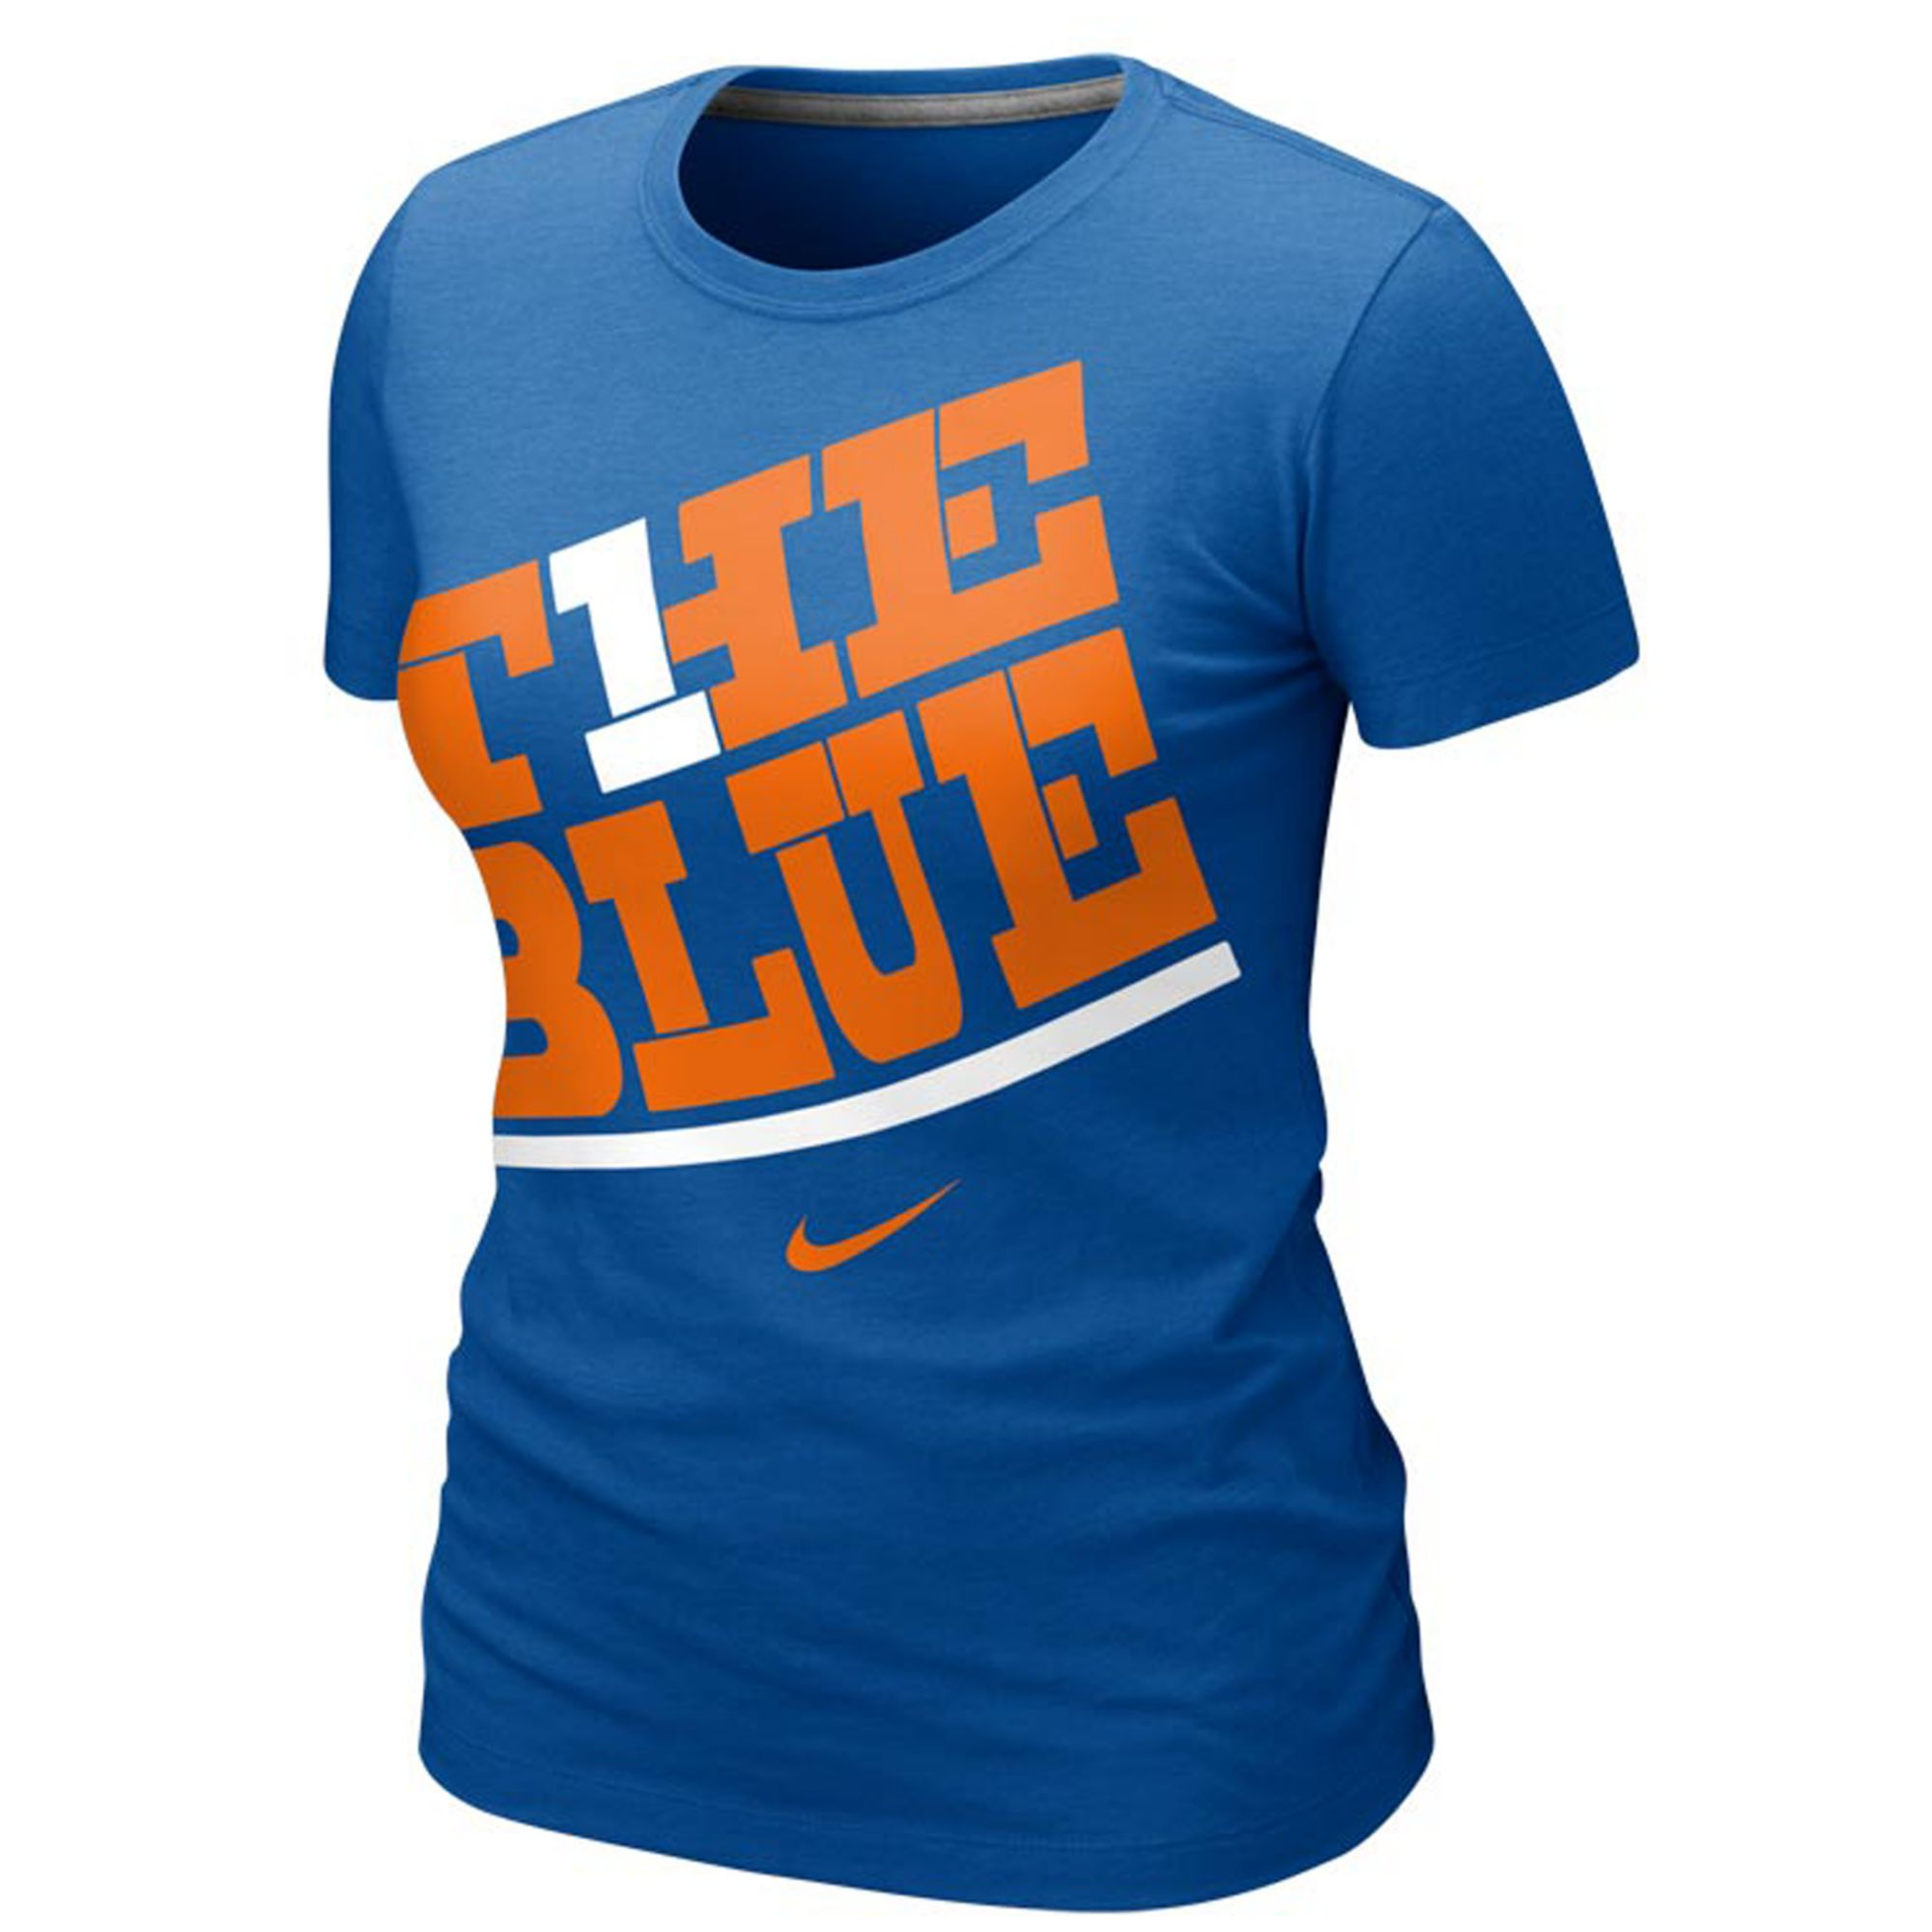 Nike short sleeve boise state broncos t shirt in blue for Boise t shirt printing